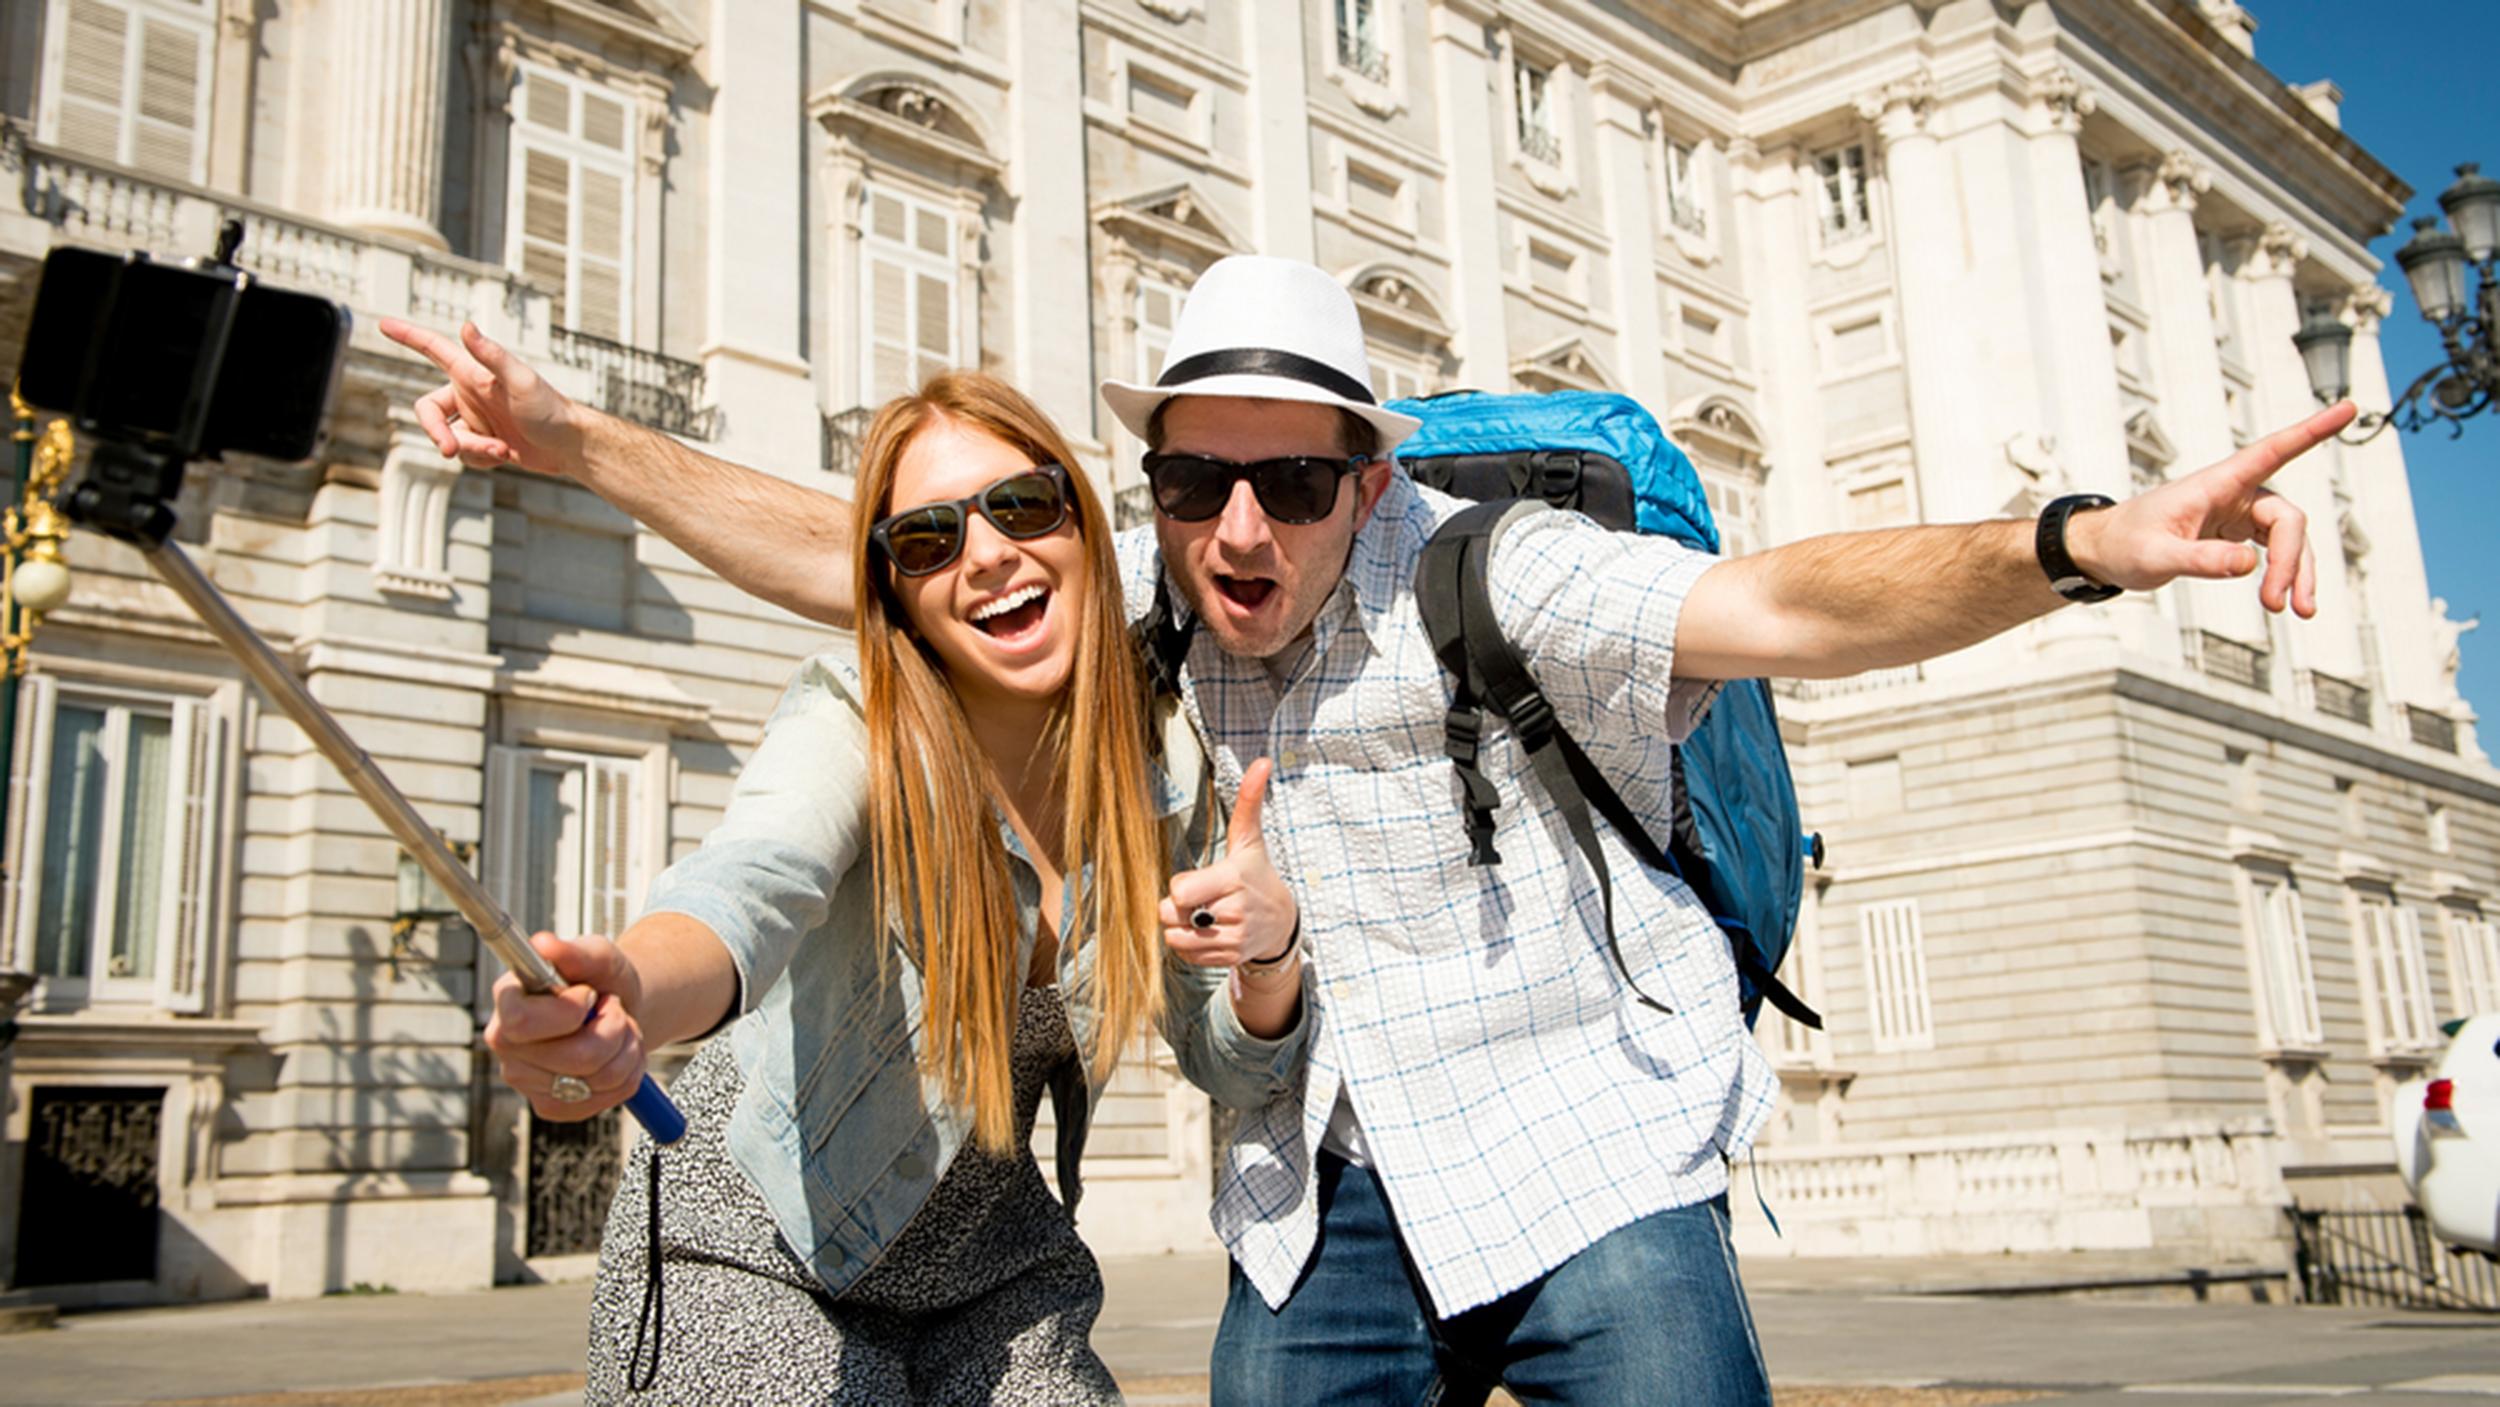 Selfie Stick Etiquette 6 Tips For Taking Great Shots